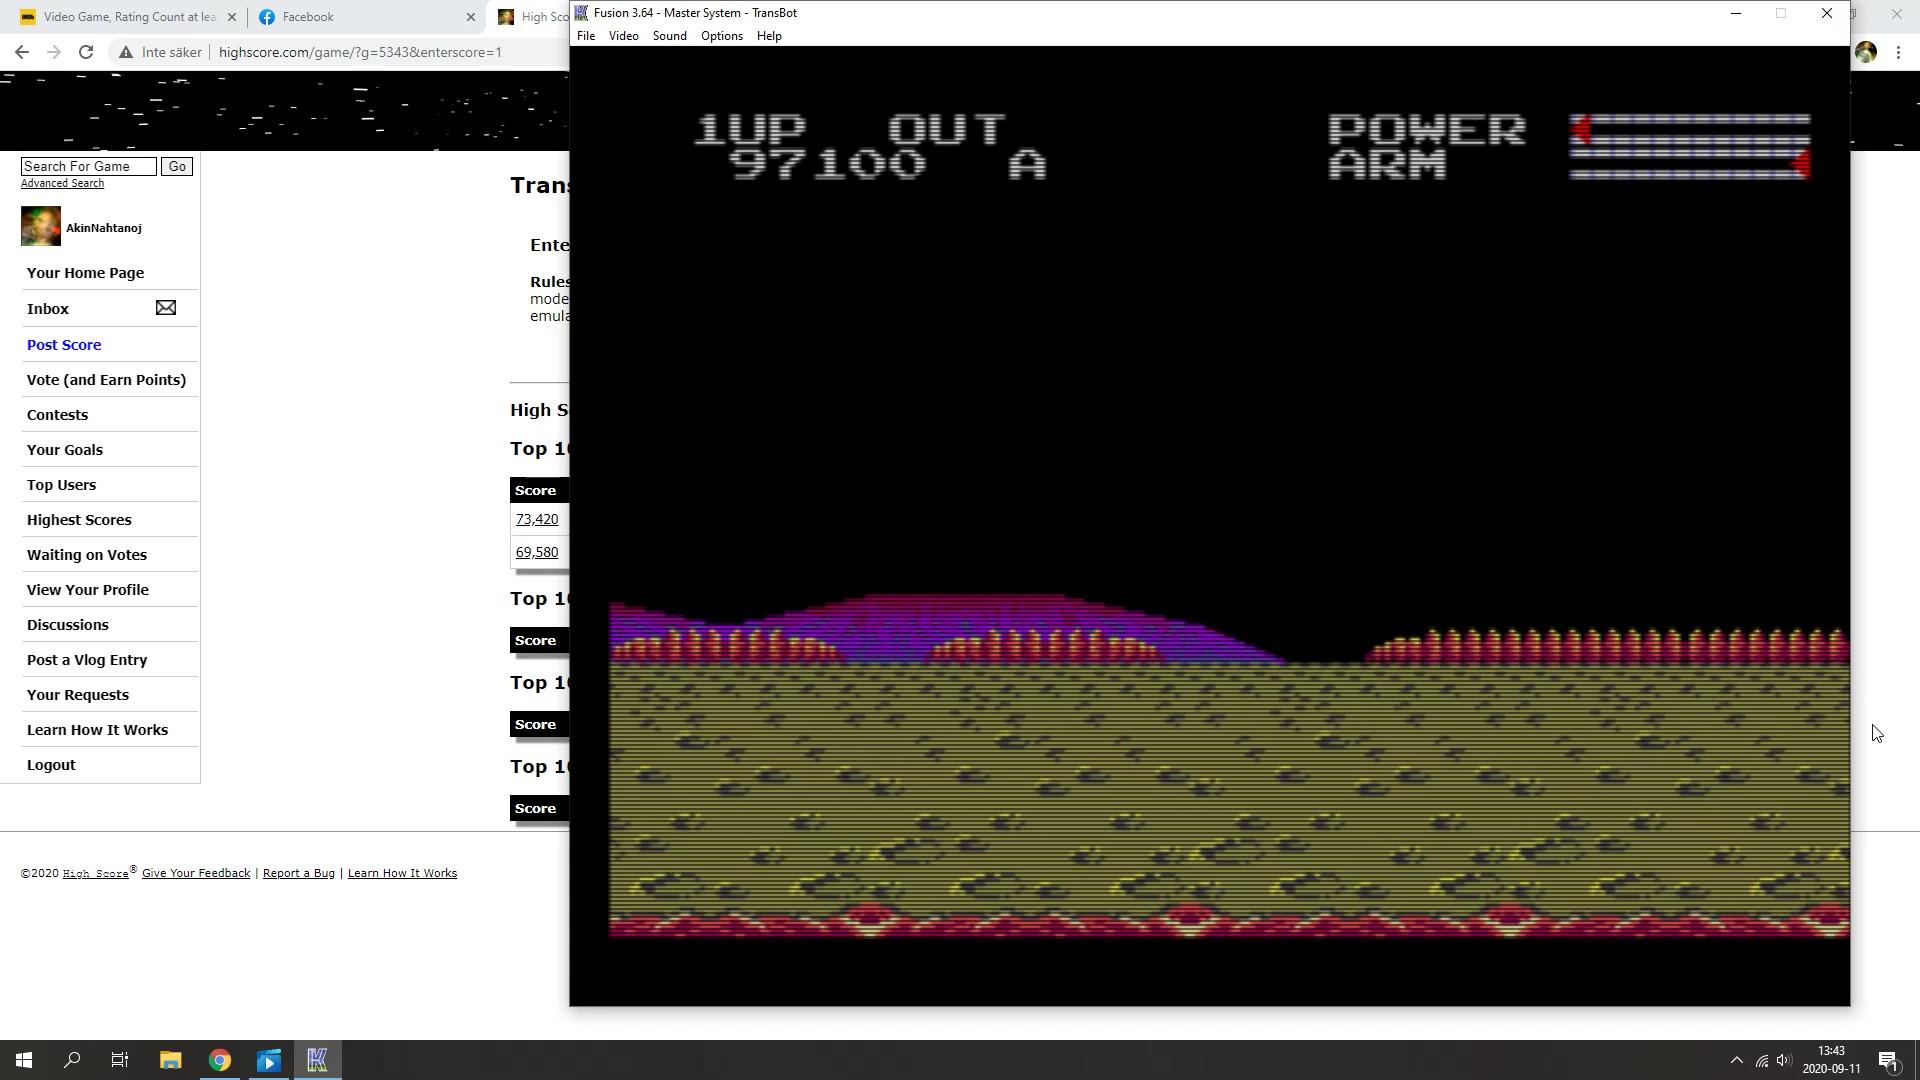 AkinNahtanoj: Transbot (Sega Master System Emulated) 97,100 points on 2020-09-11 08:53:21